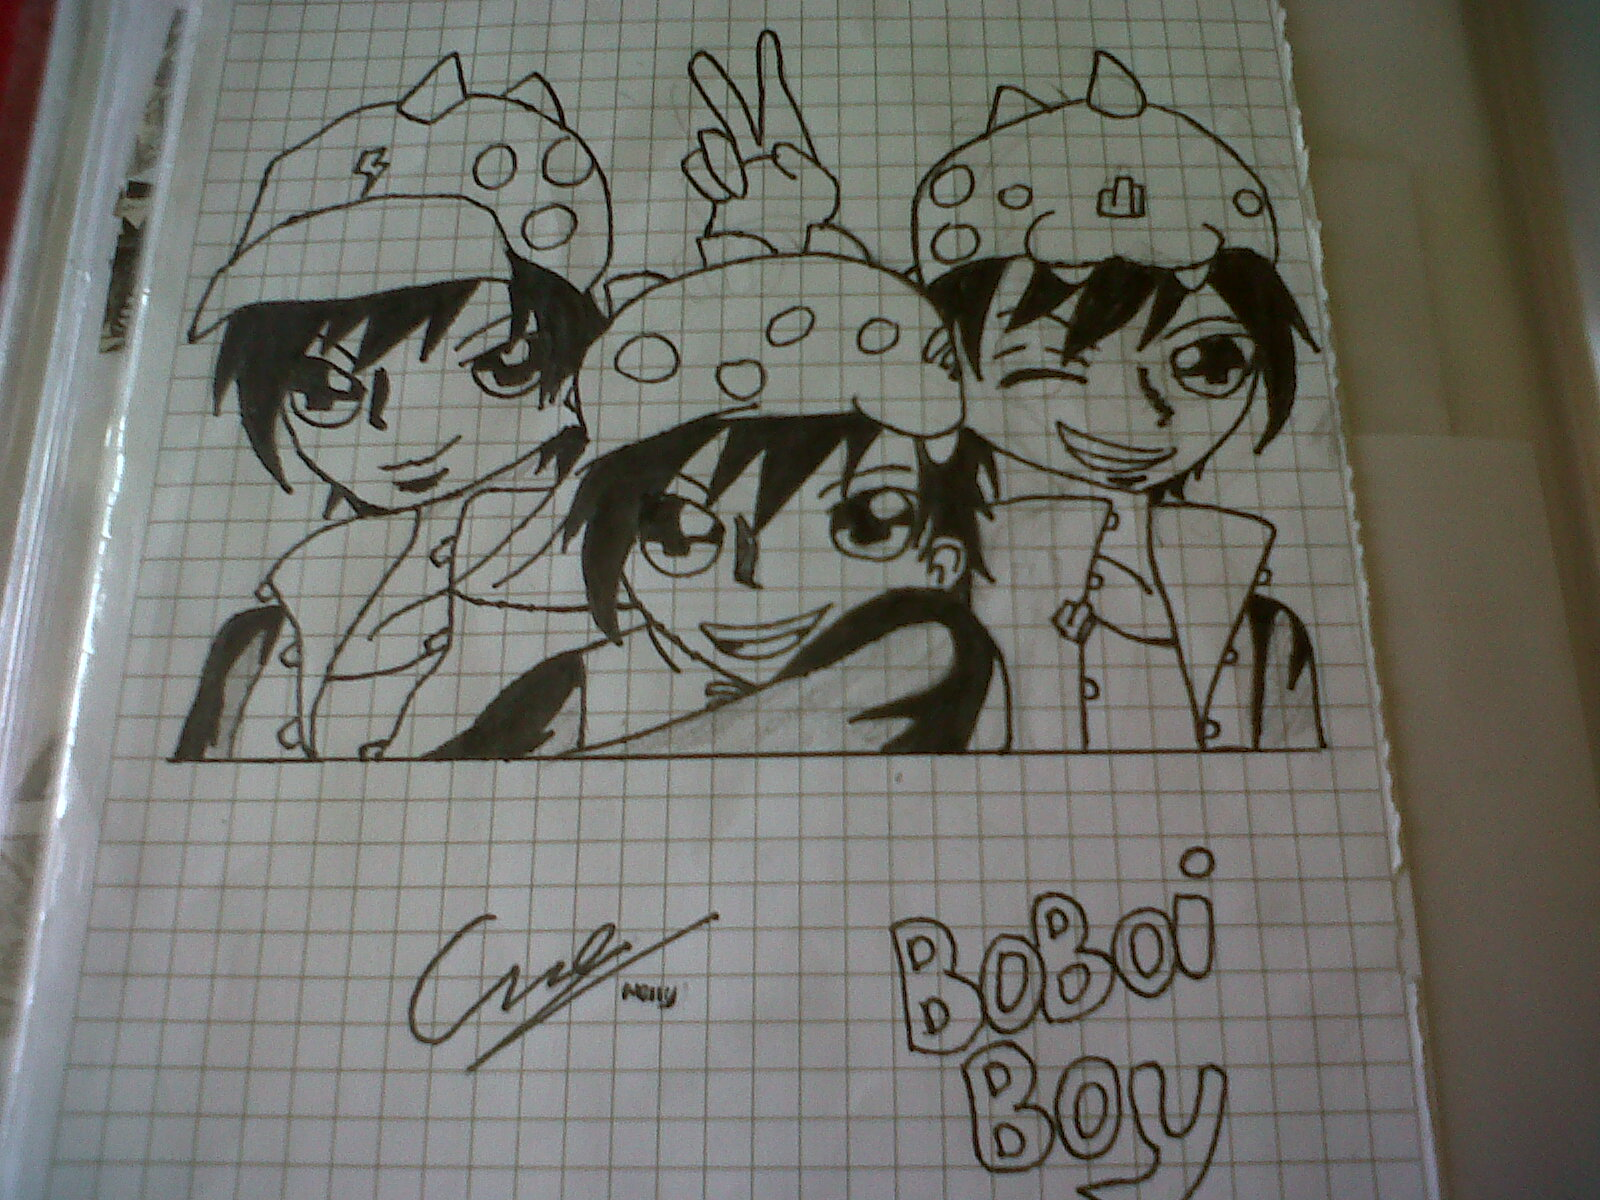 BoBoiBoy fan art da me